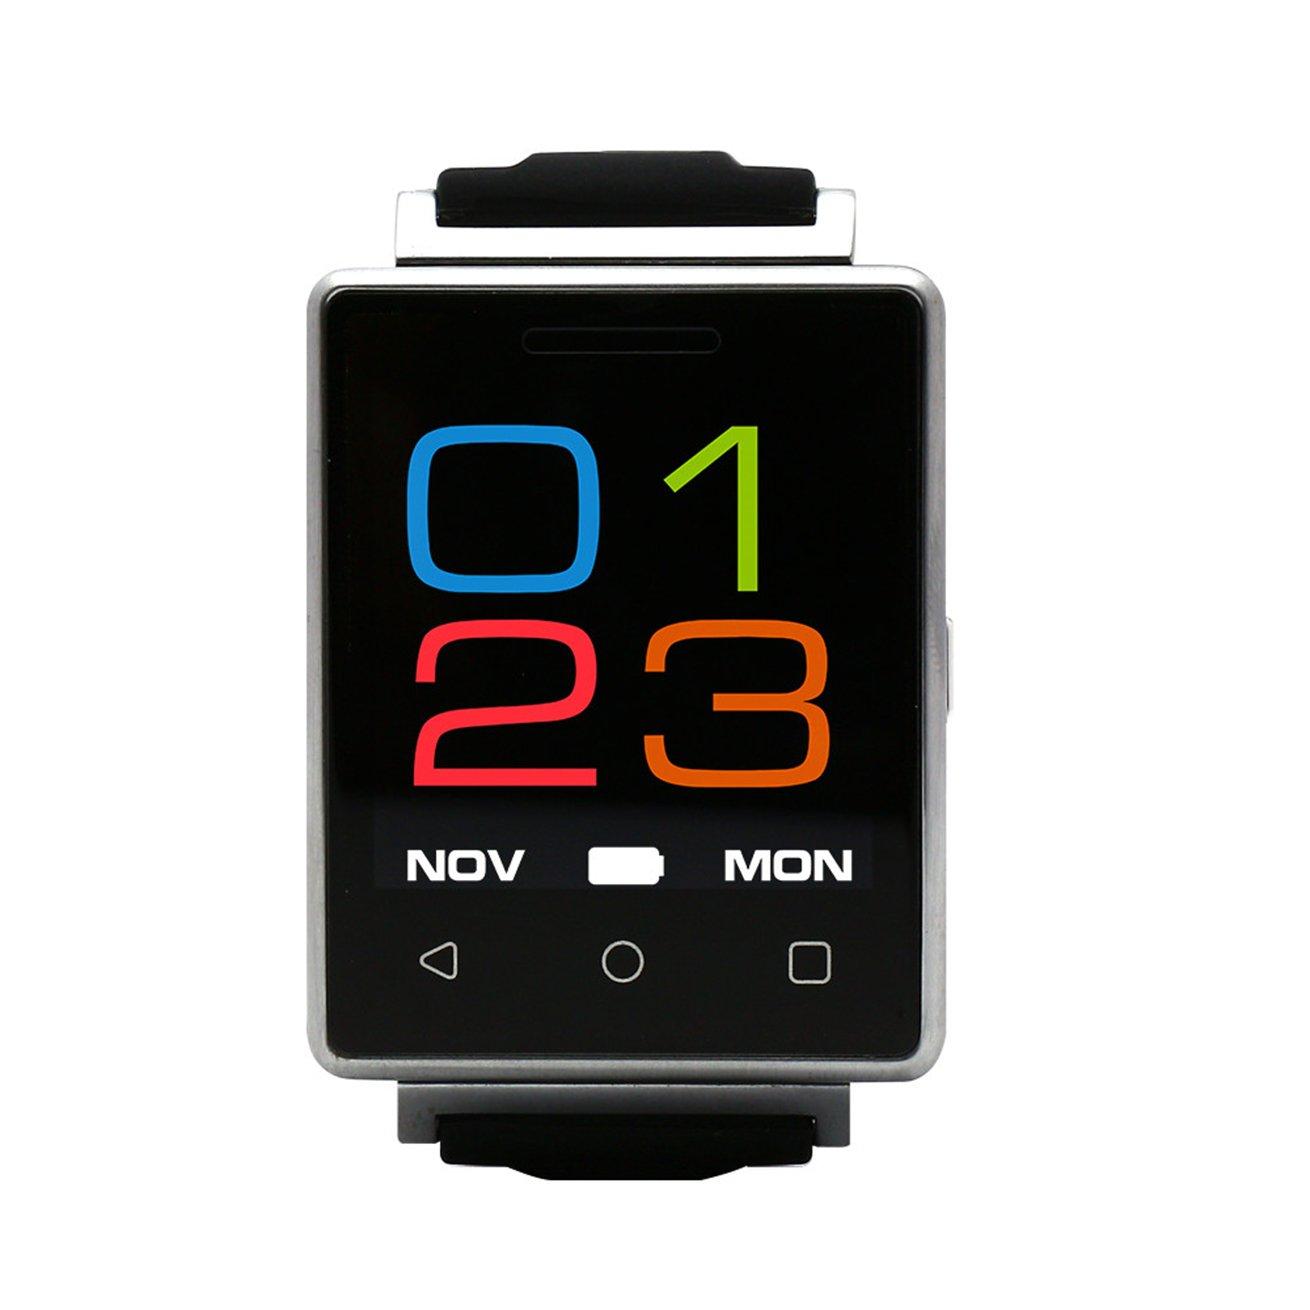 Sport Reloj de pulsera mujer fitness - Tracker - Tensiómetro Bluetooth podómetro pulsera Polar Loop Pulsómetro Fitness pulsera mujer elegante Alemán Soporte ...